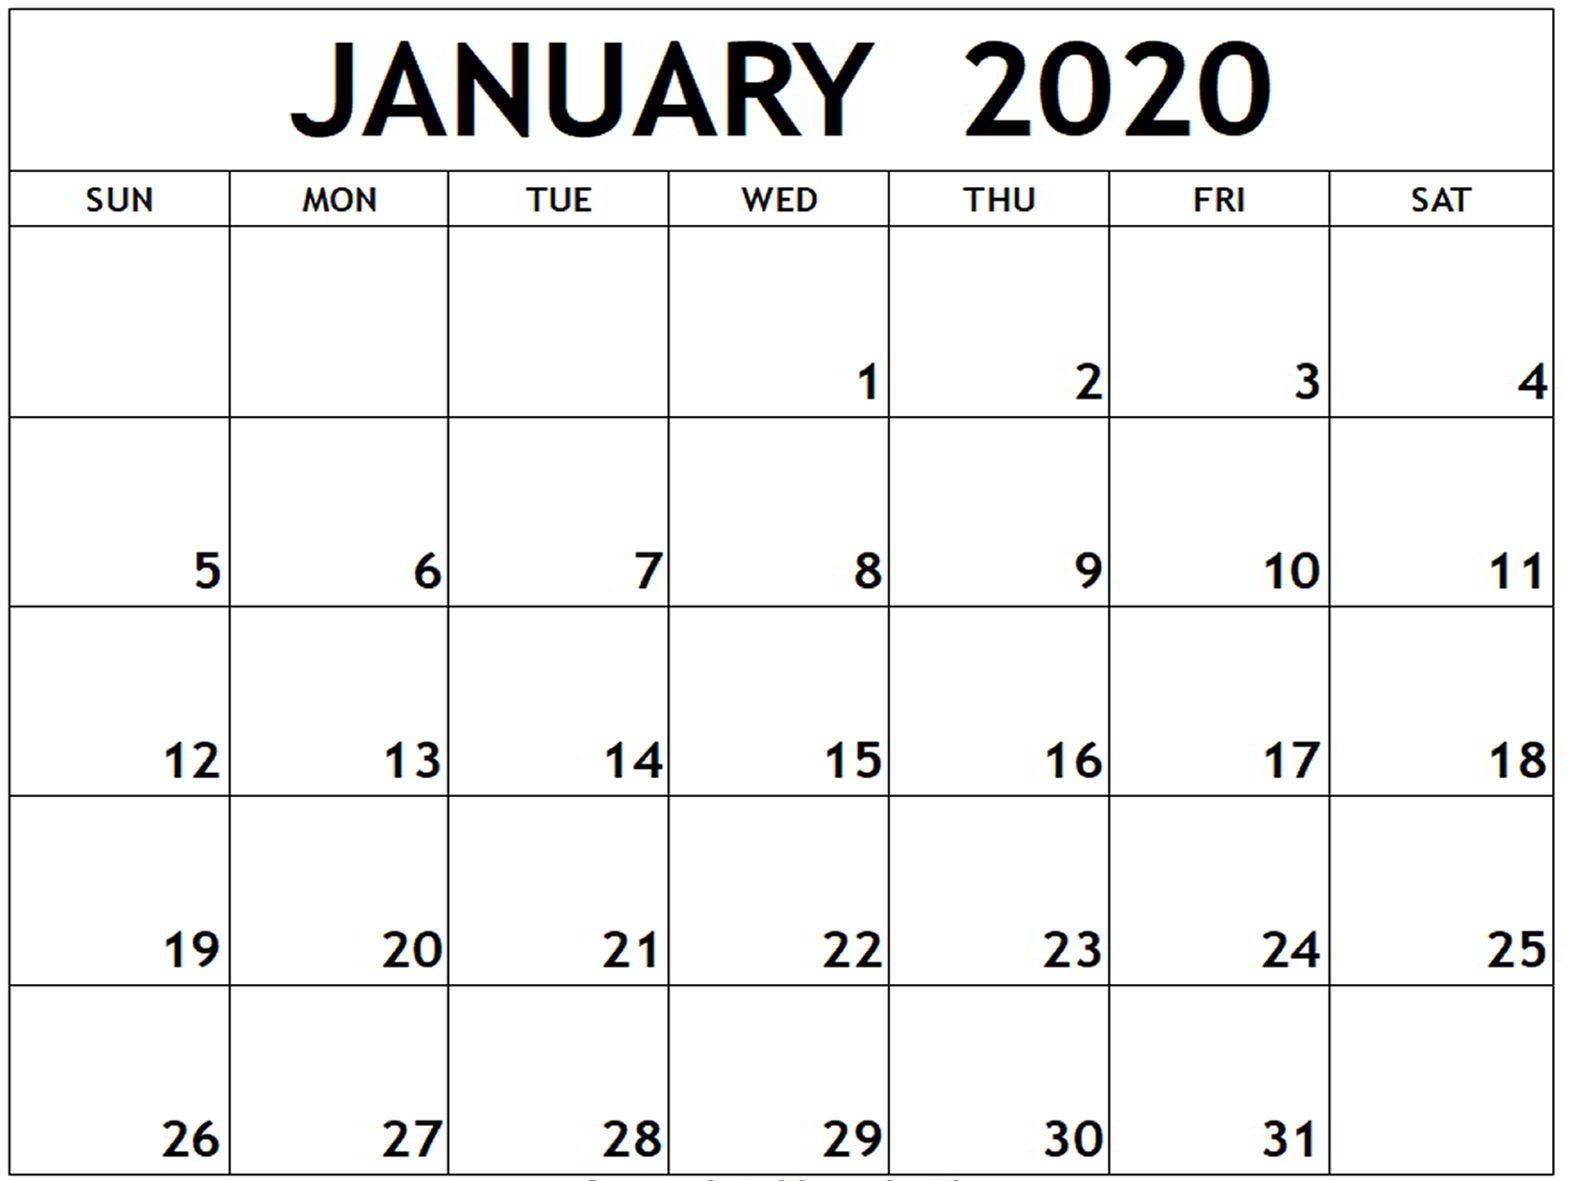 Free Editable January Calendar 2020 Printable Template With